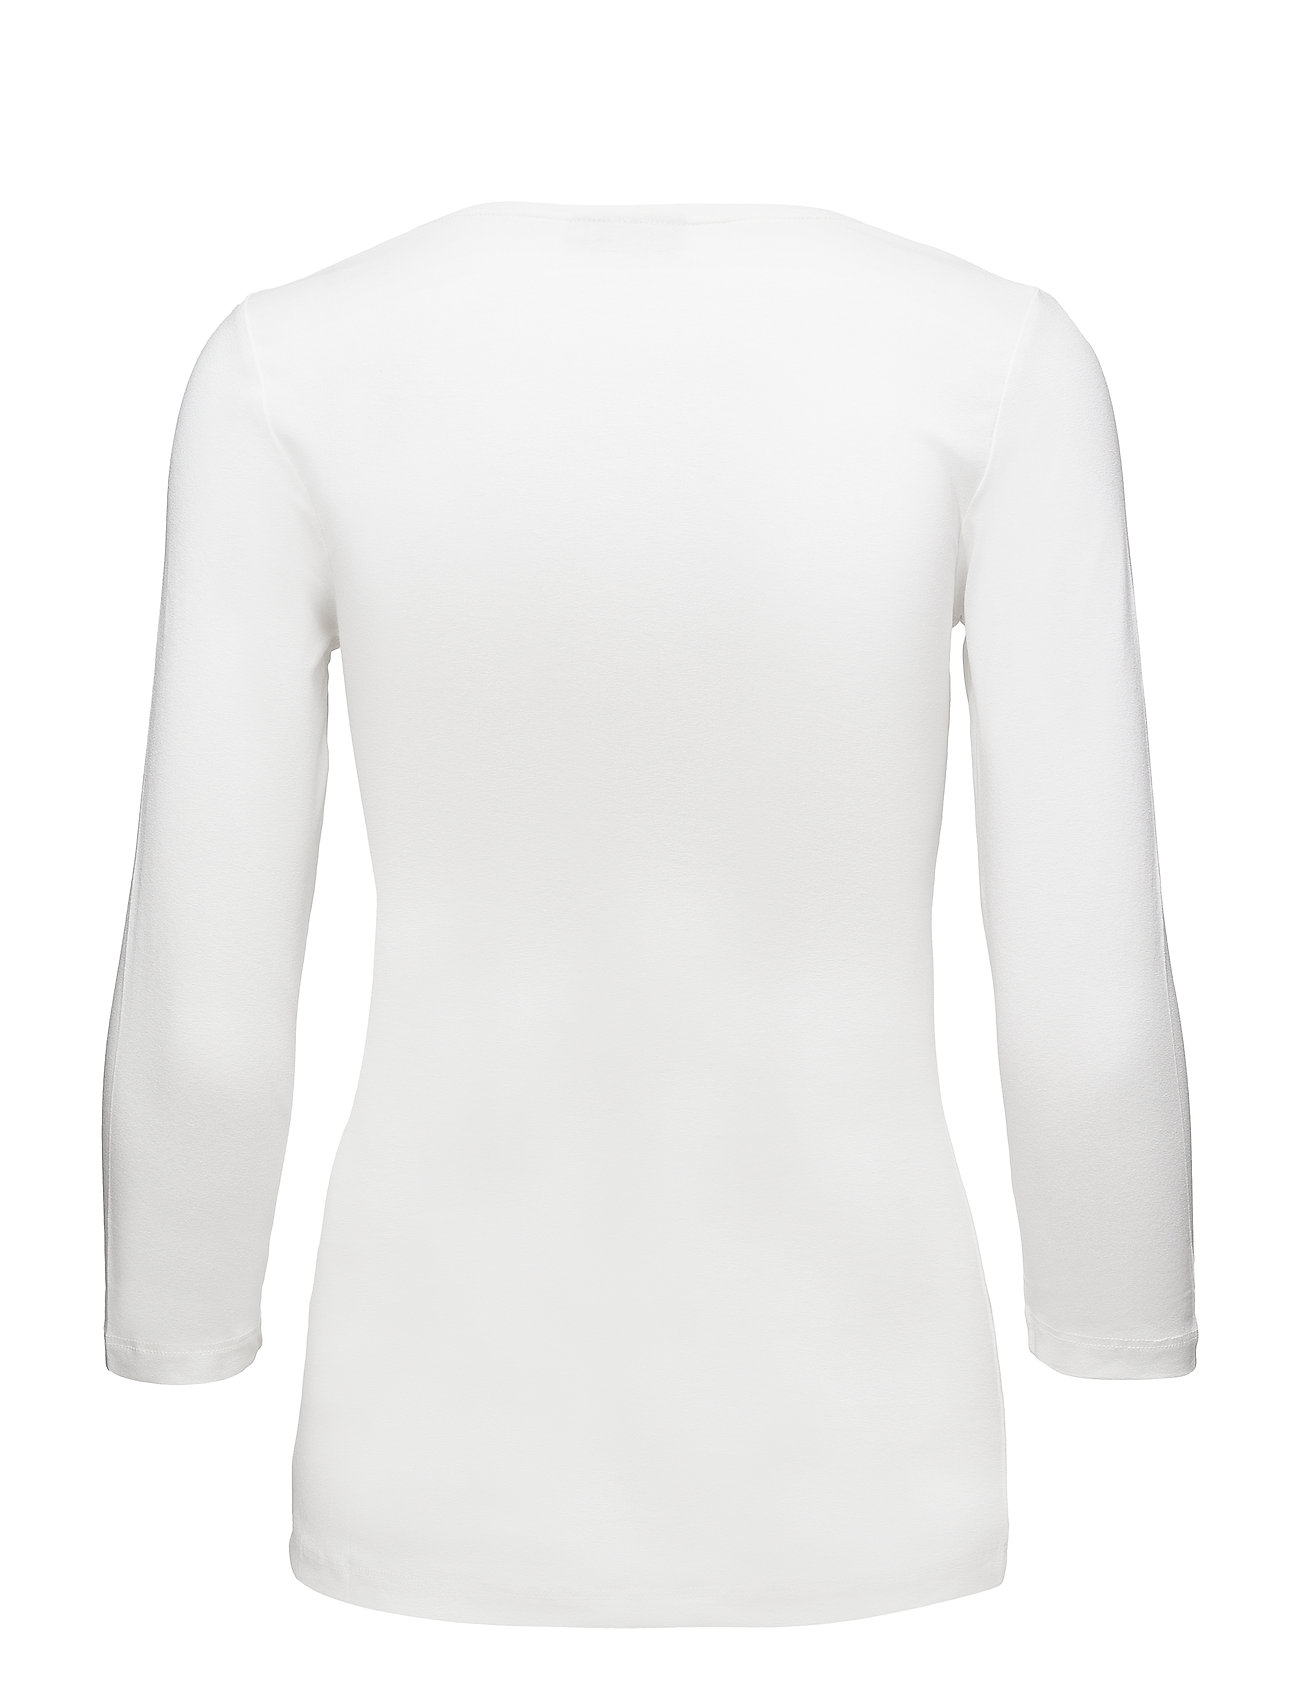 Kiksen 2 Tshirt Langærmet T shirt Hvid Fransa